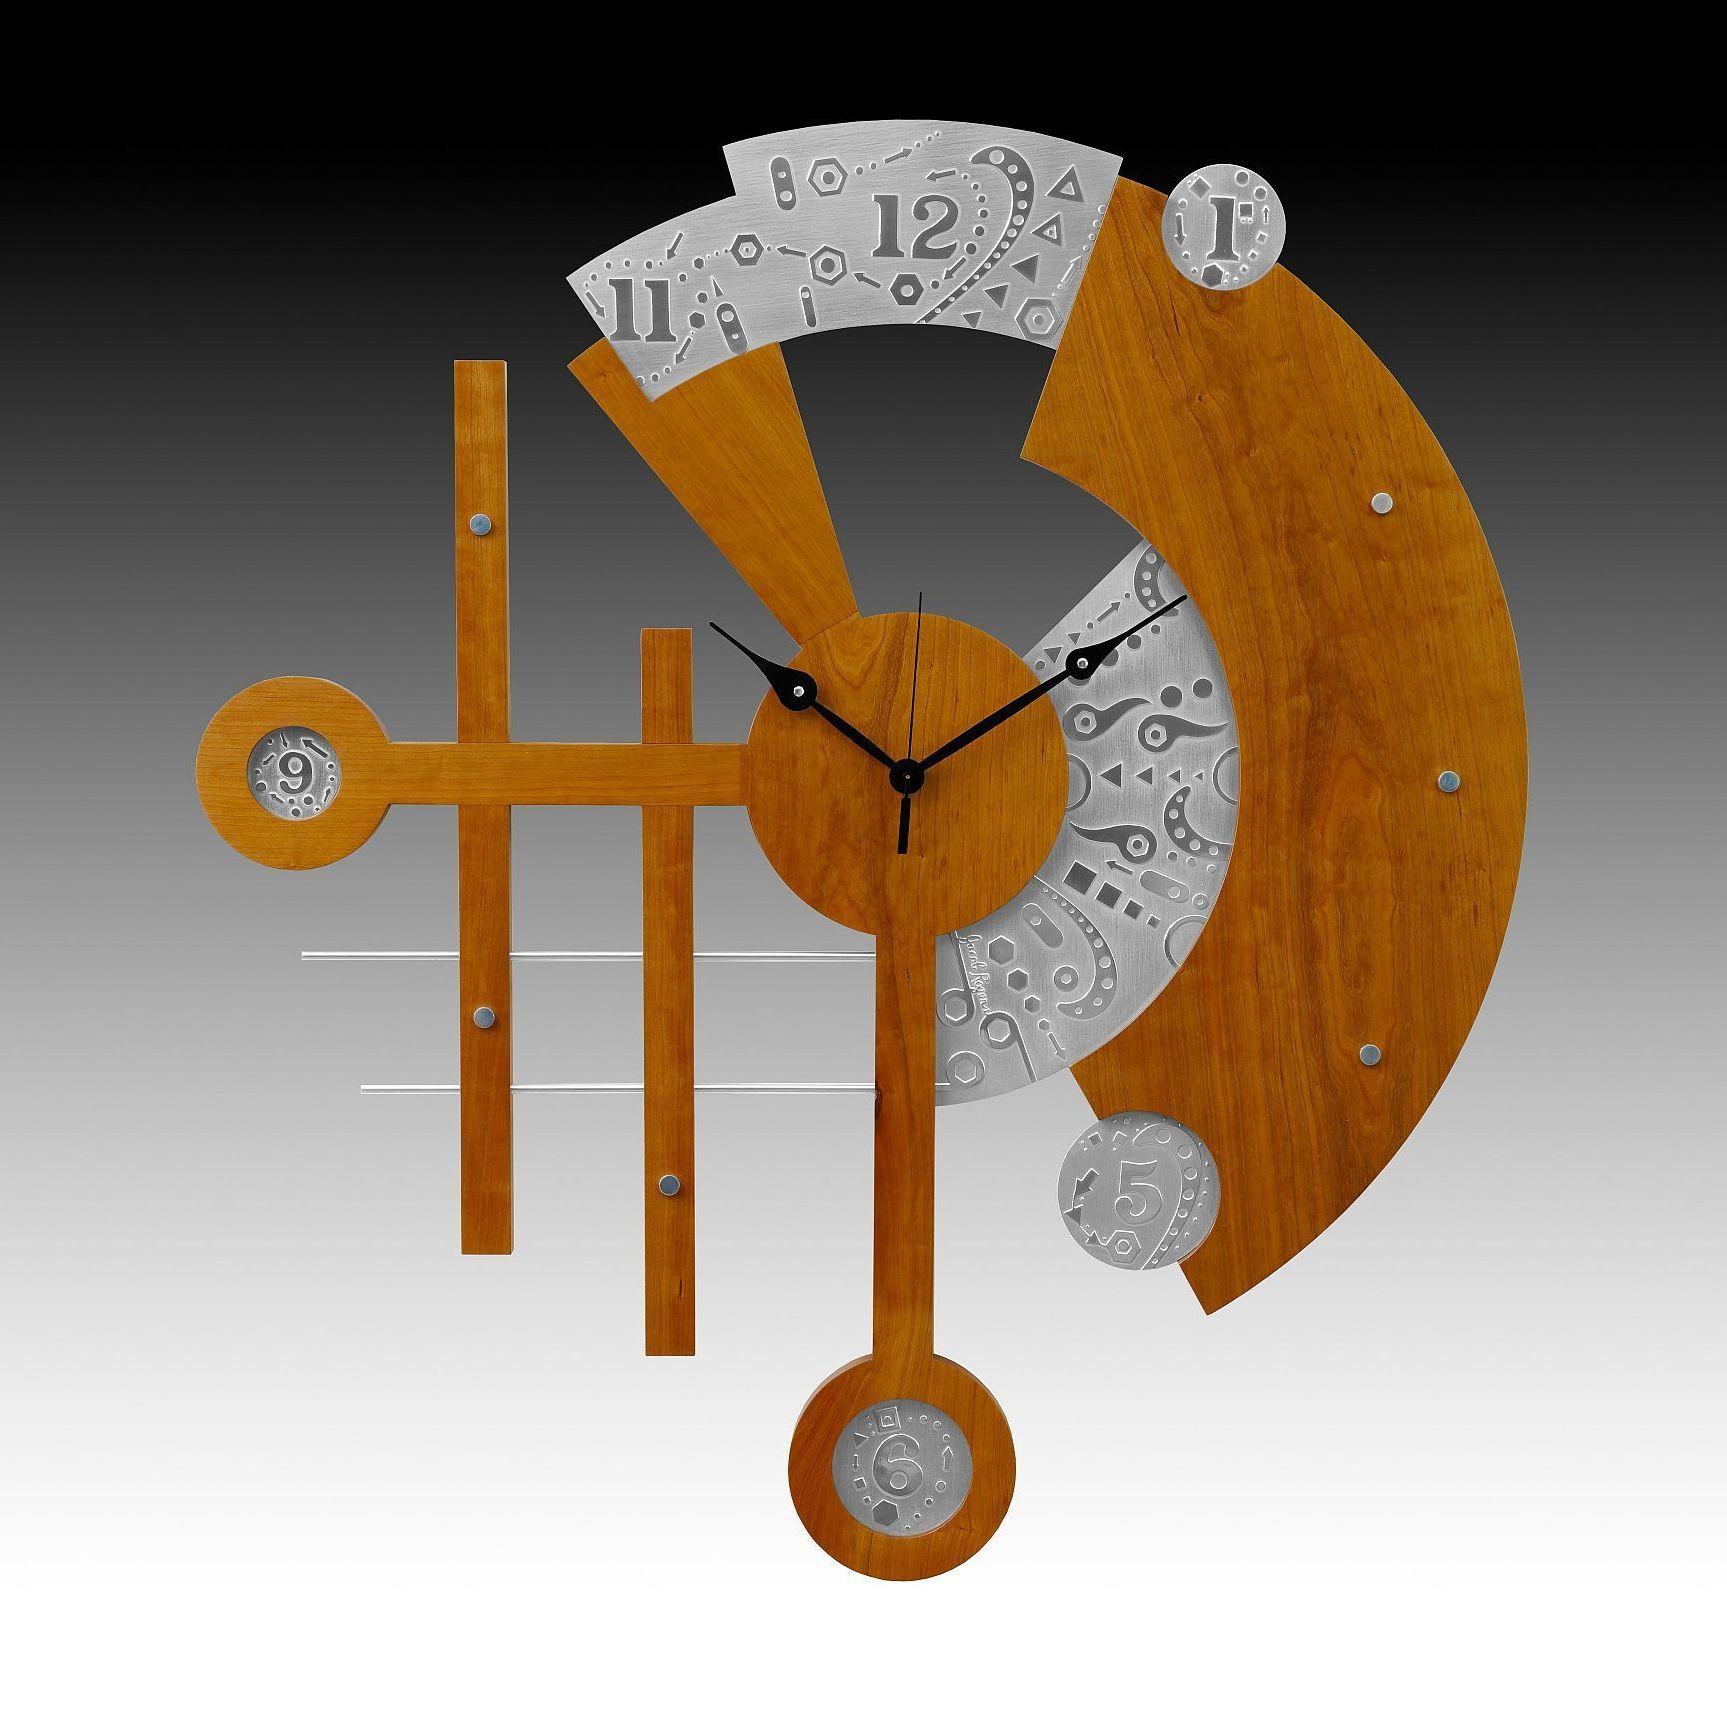 ornate orange stylized wooden clock